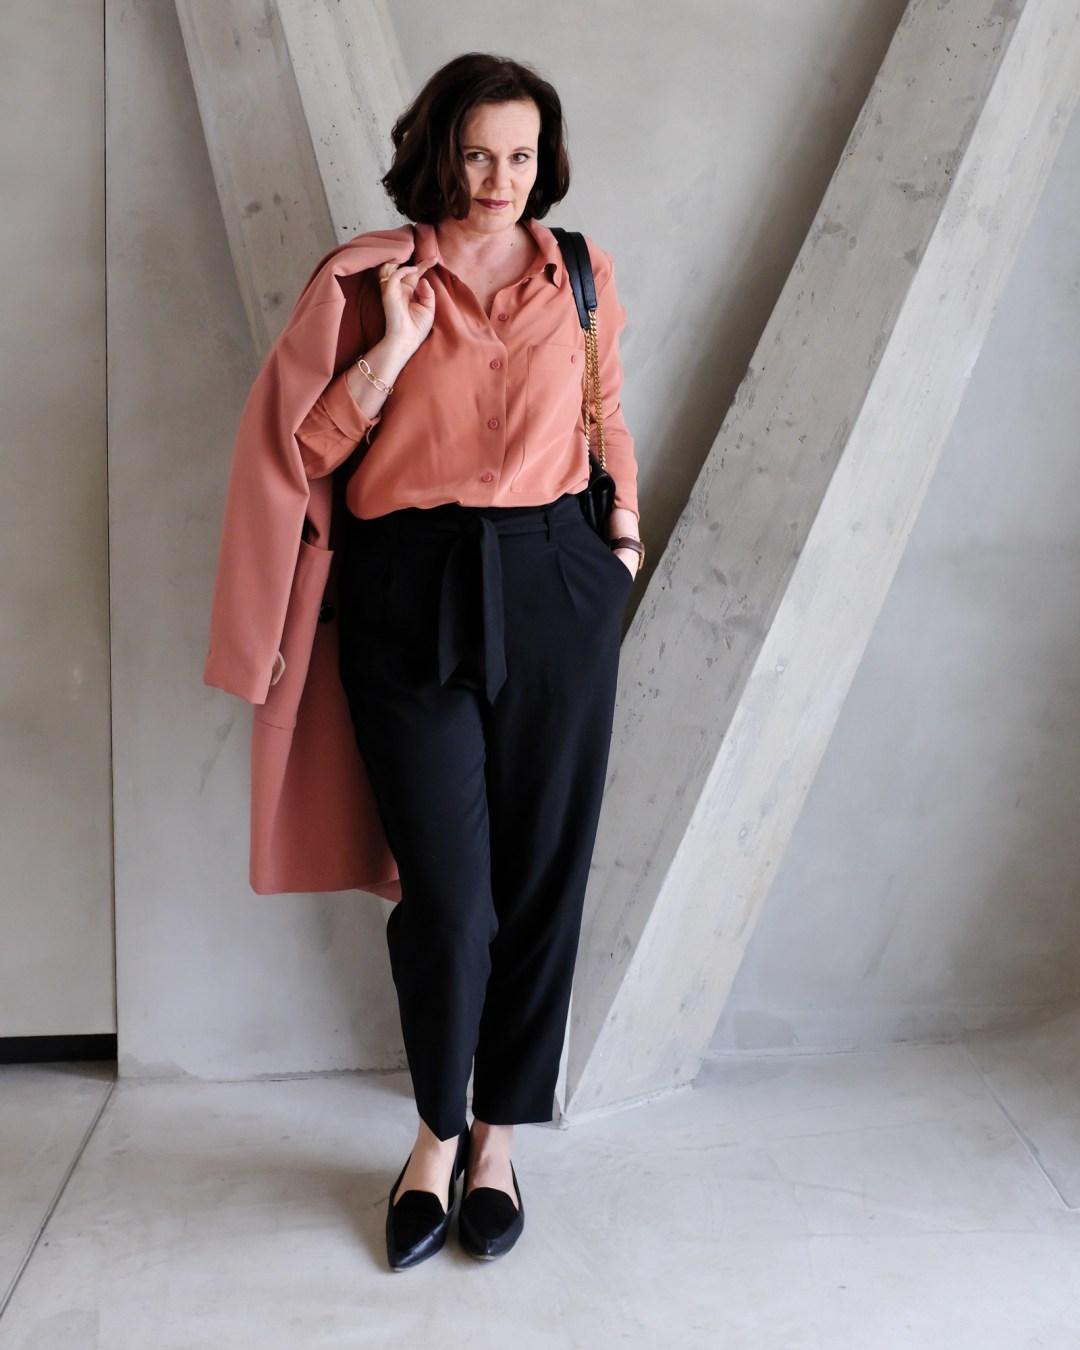 inastil, Trenchcoat, Springcoat, Frühjahrsmode, Stilberatung, Ü50Mode, Modeberatung, Frühlingsfarben, Modeblogger-7